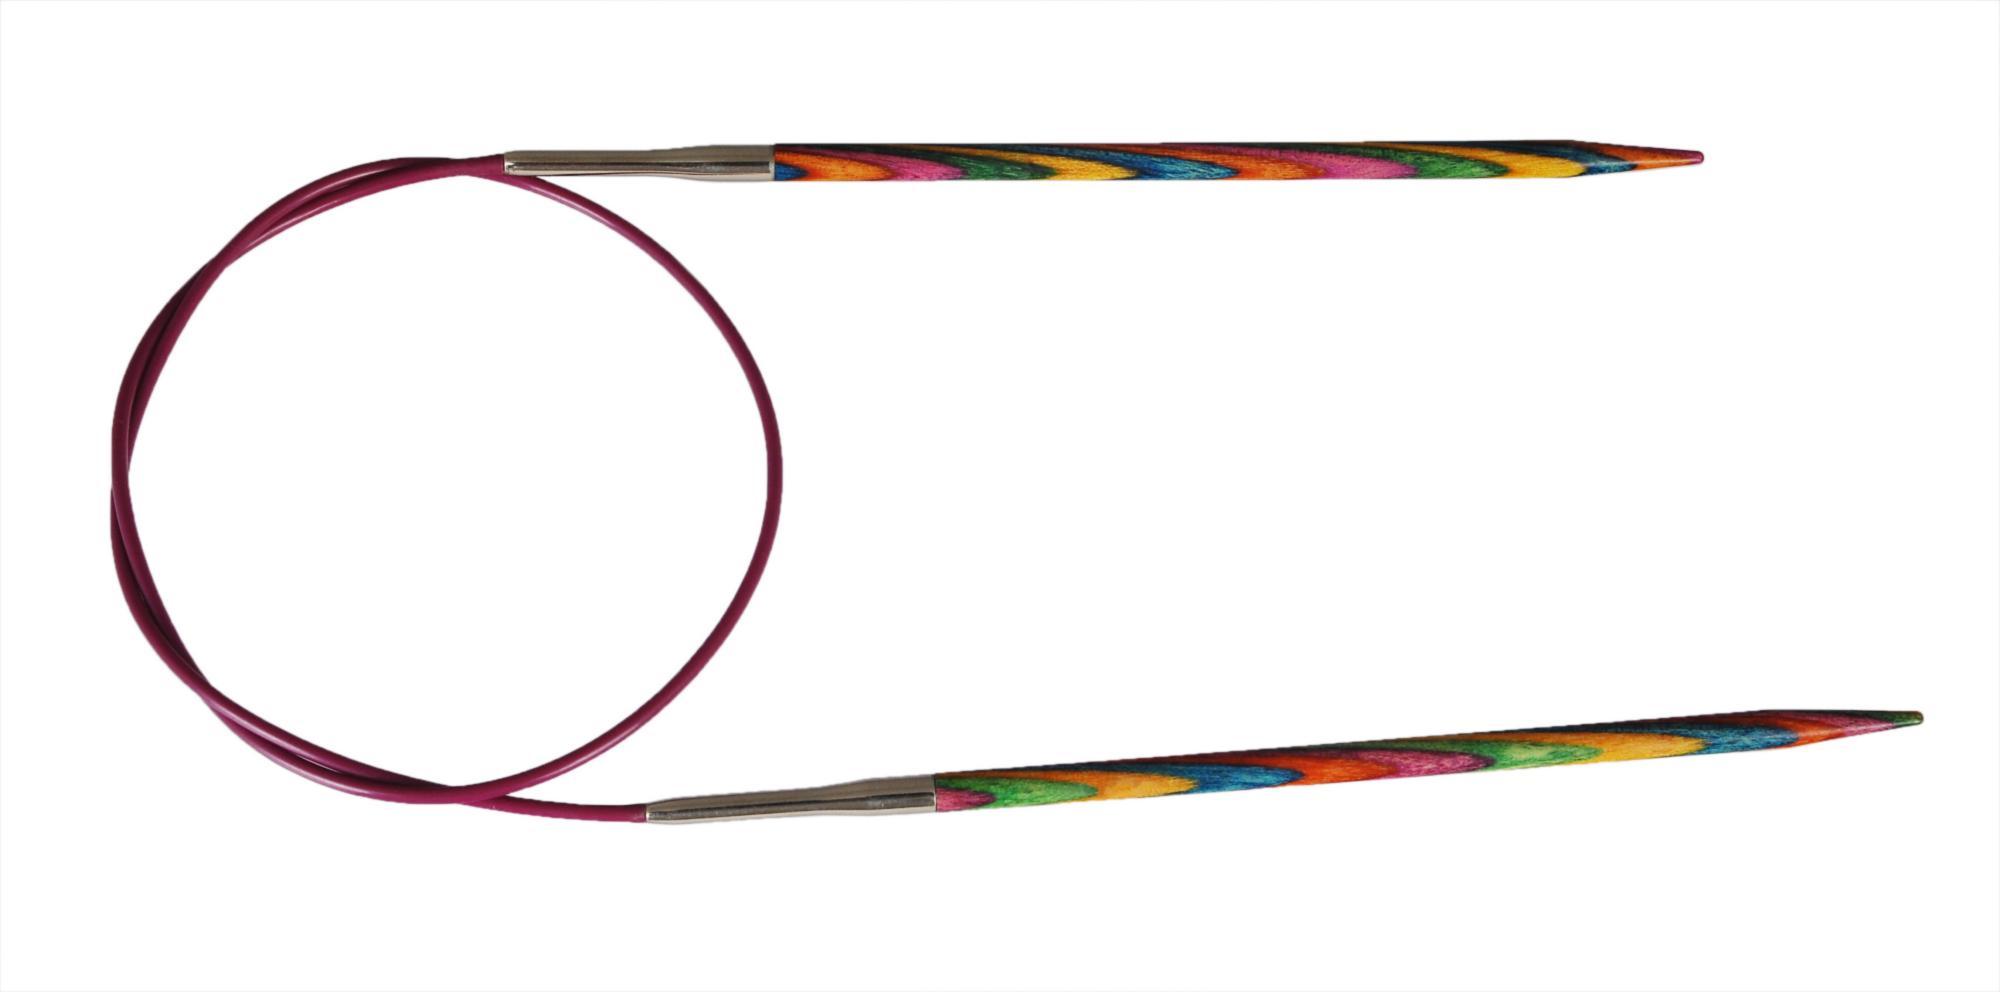 Спицы круговые 150 см Symfonie Wood KnitPro, 20516, 3.25 мм